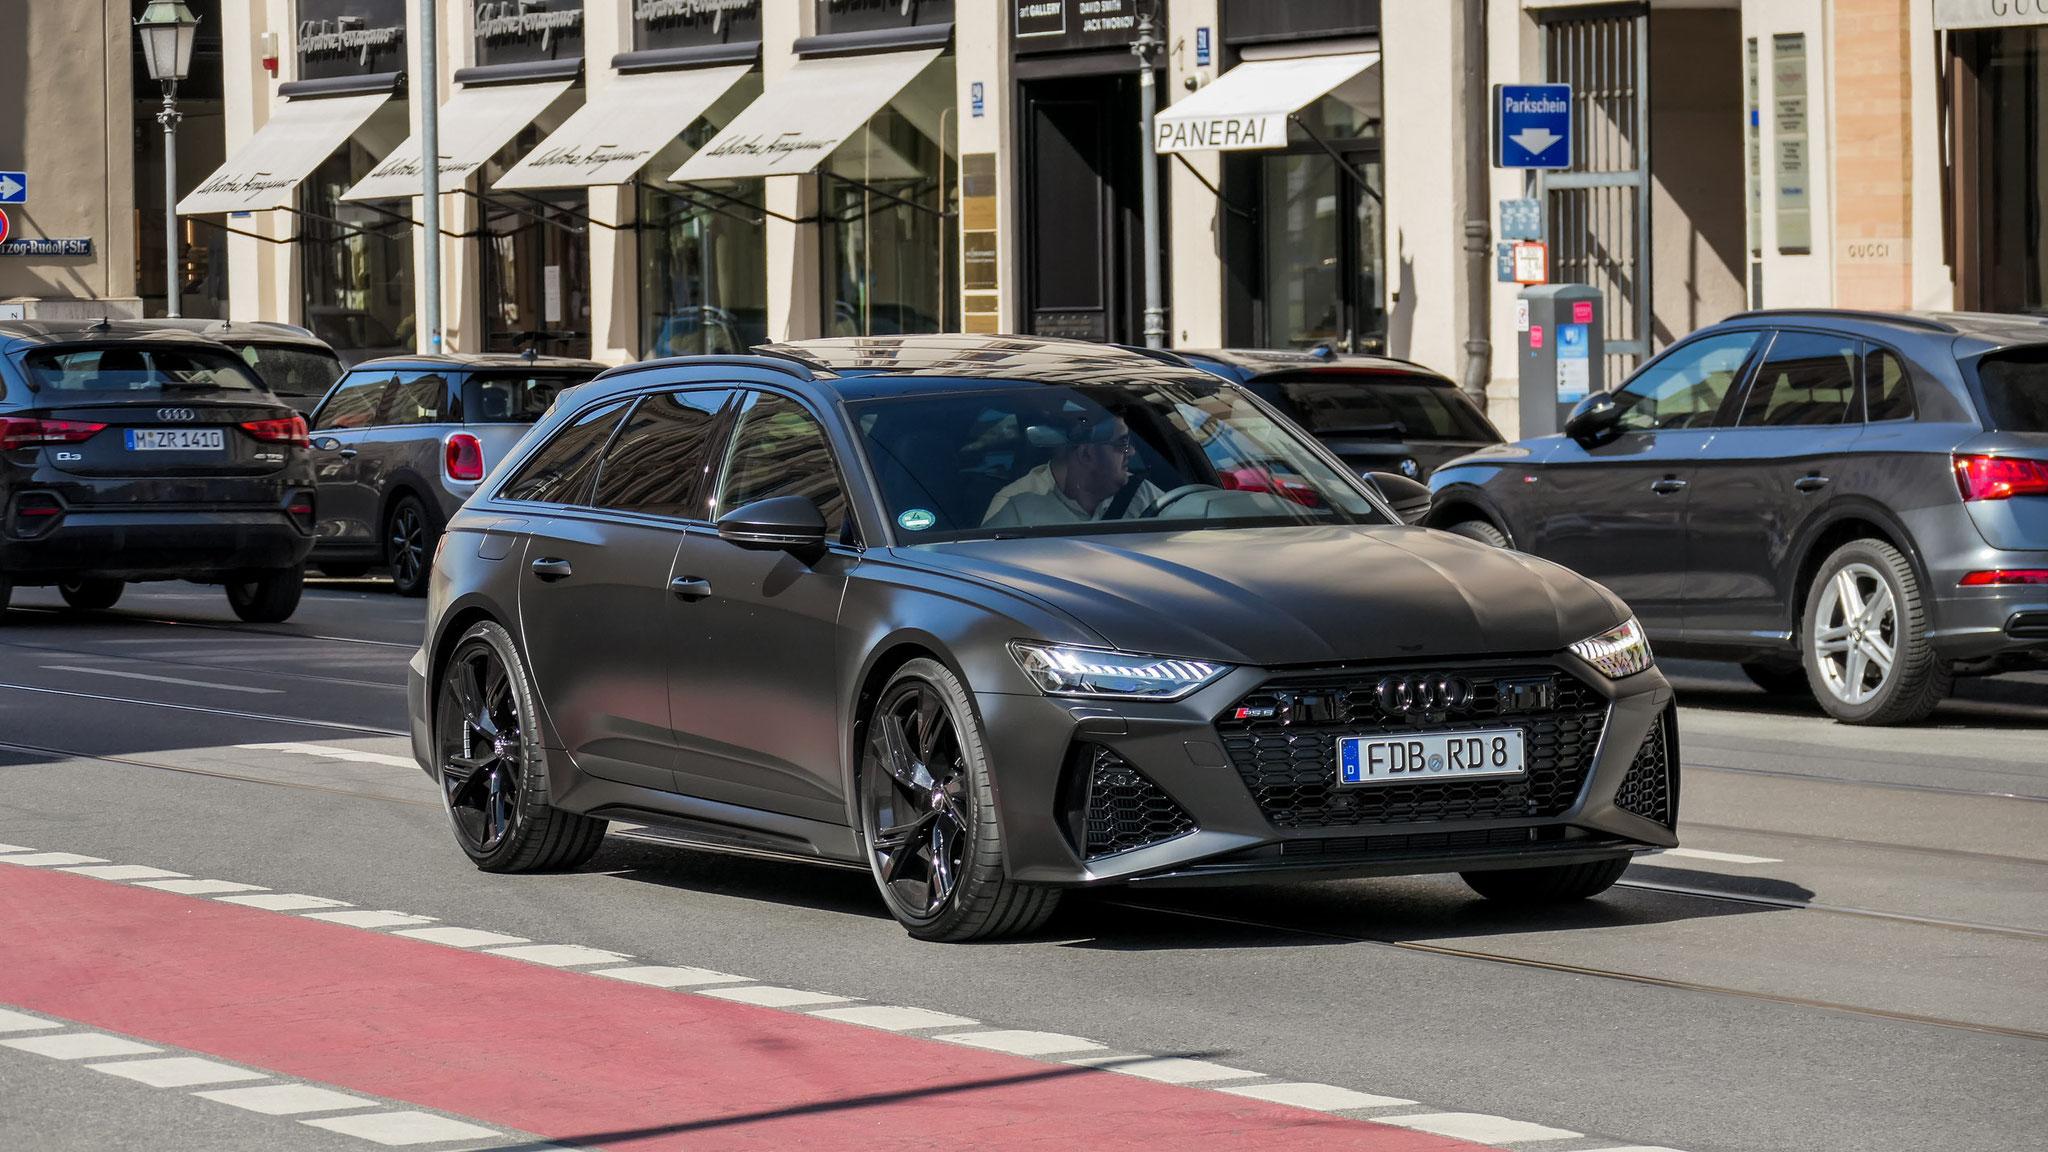 Audi RS6 - FDB-RD-8